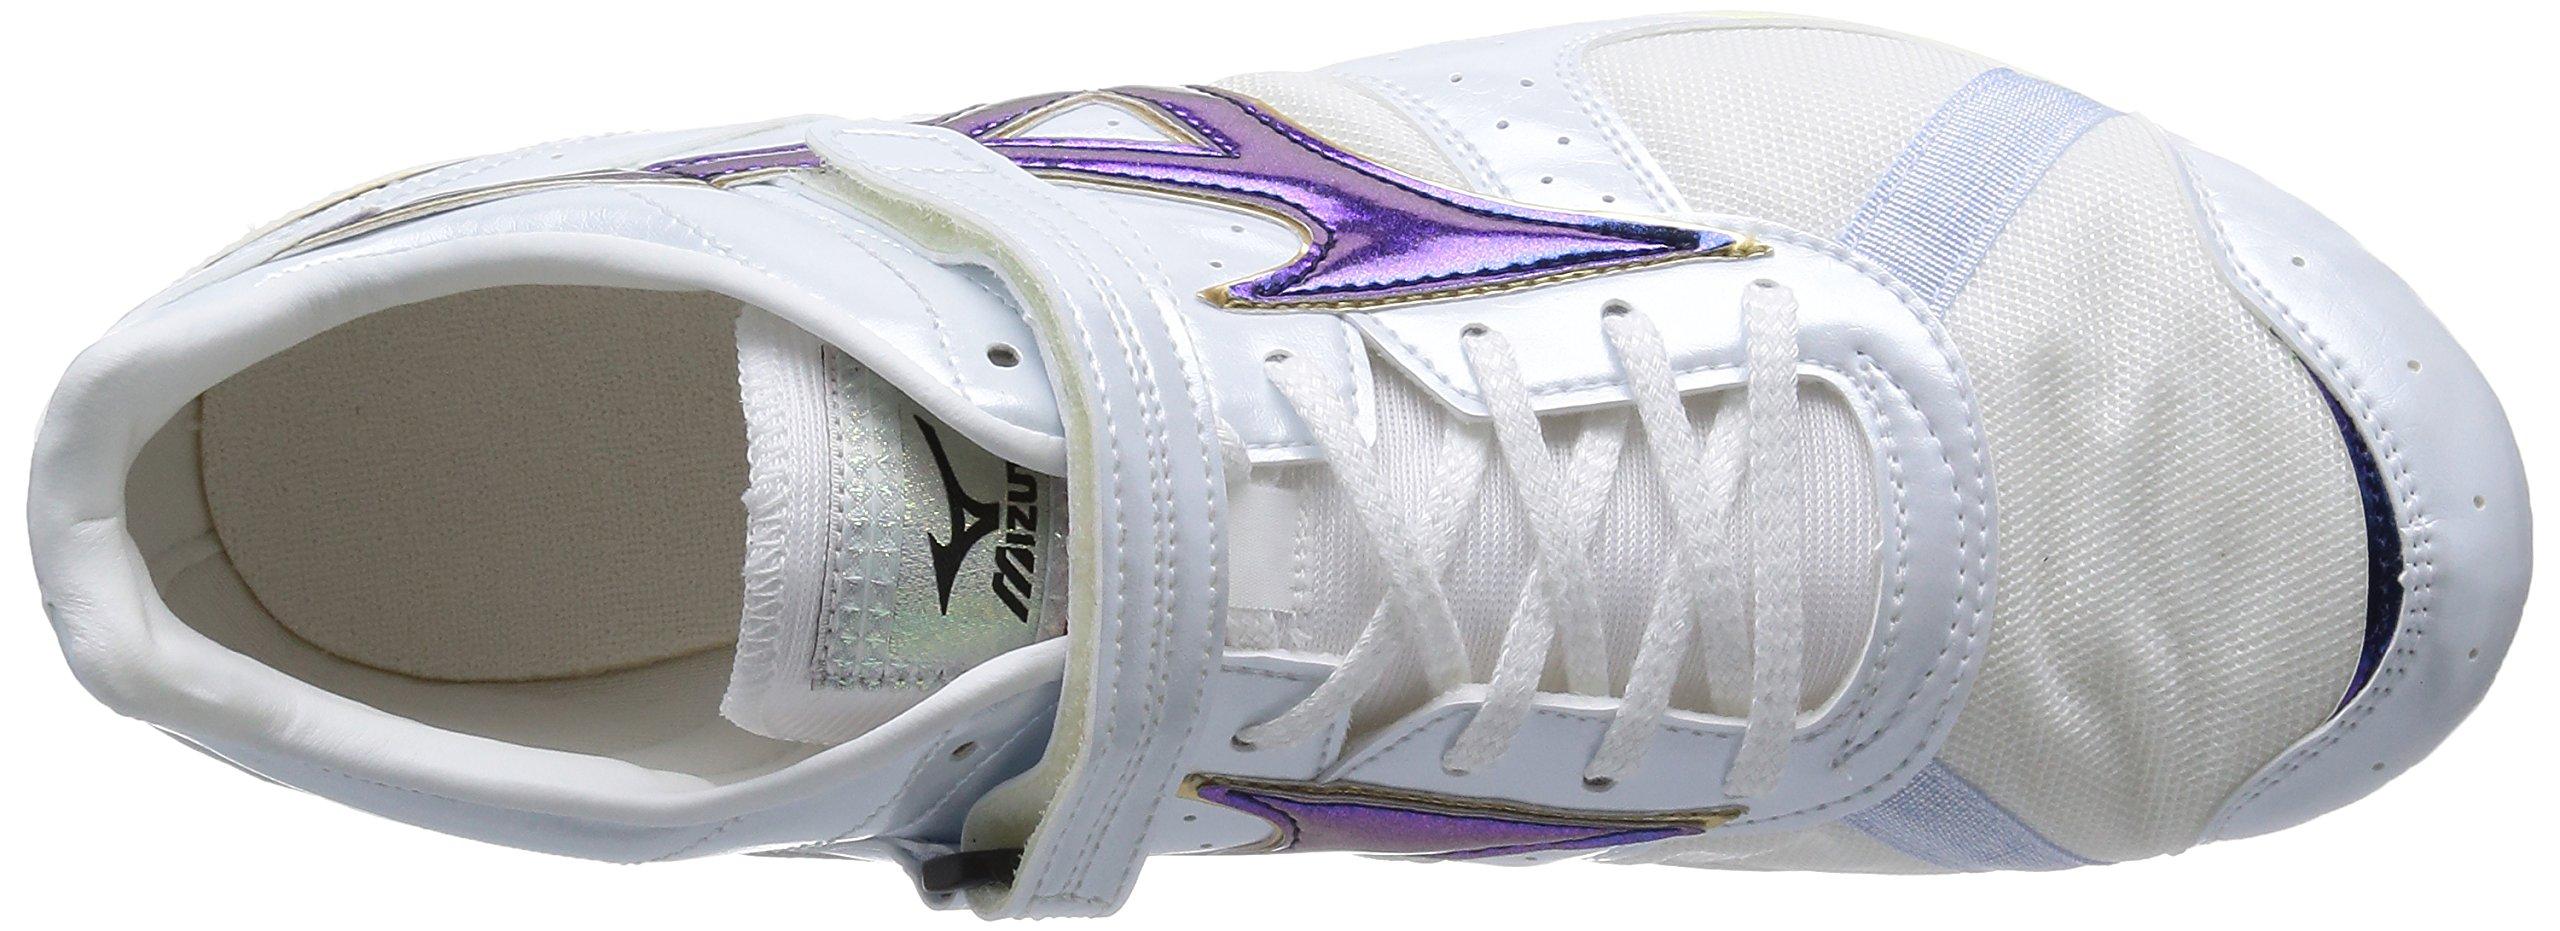 Mizuno Men's Field GEO LJ Track Shoes Yellow US 10.5 by Mizuno (Image #7)